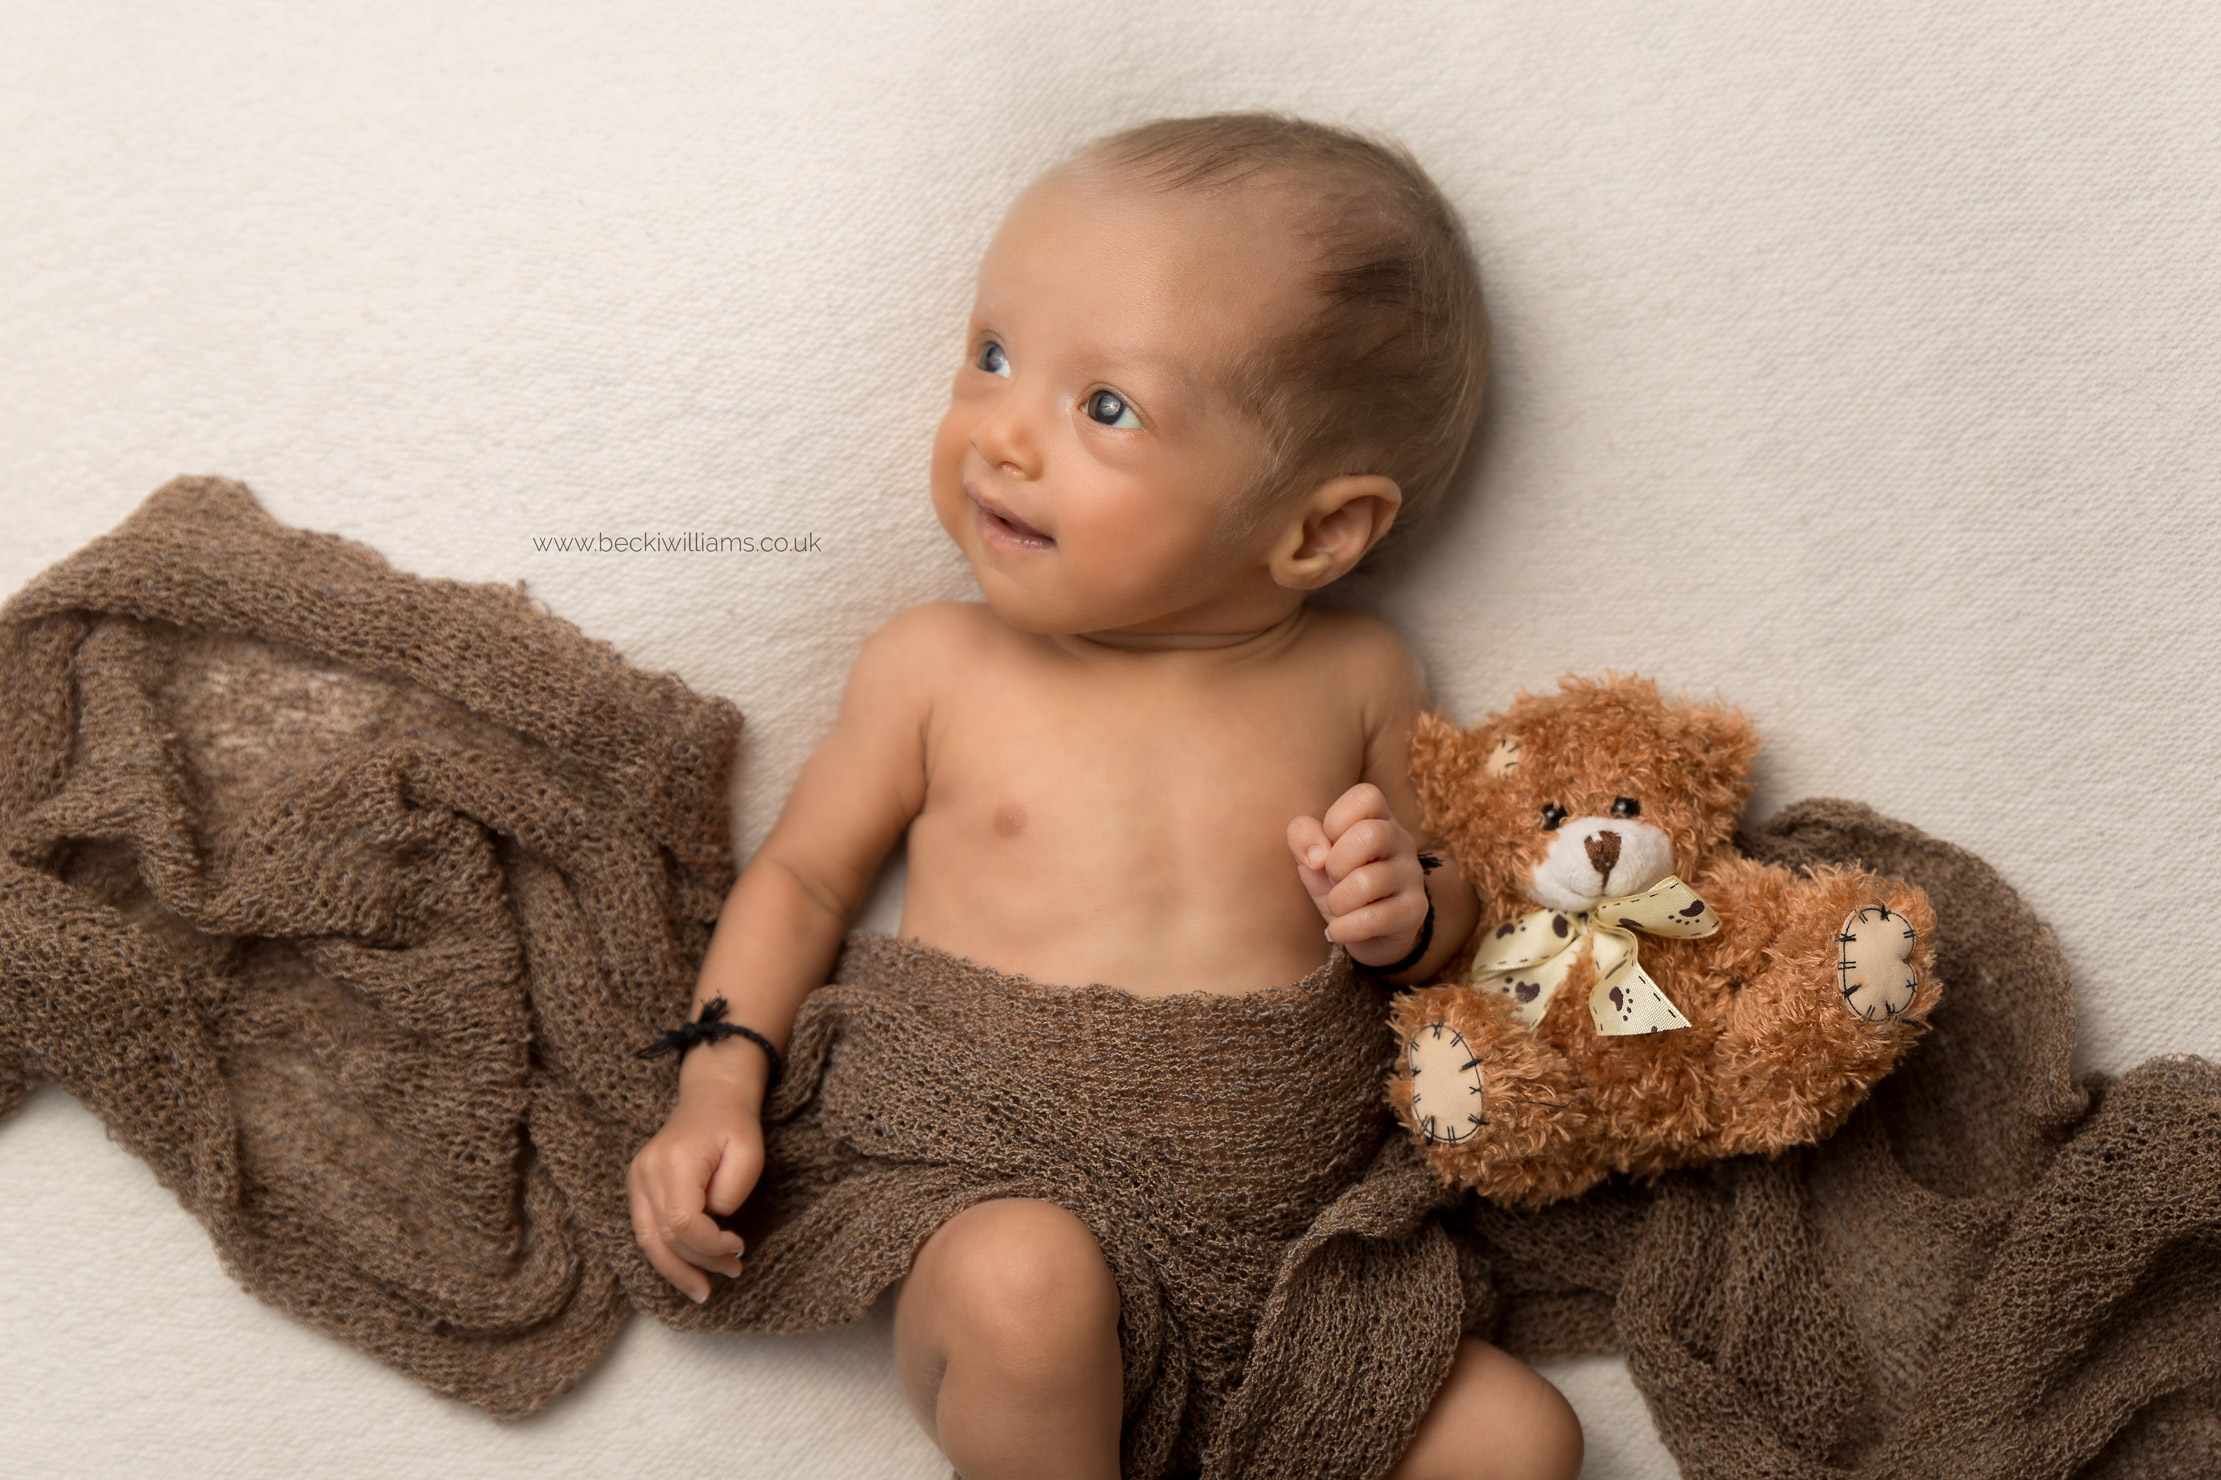 photographer-in-hemel-hempstead-newborn-baby-4.jpg